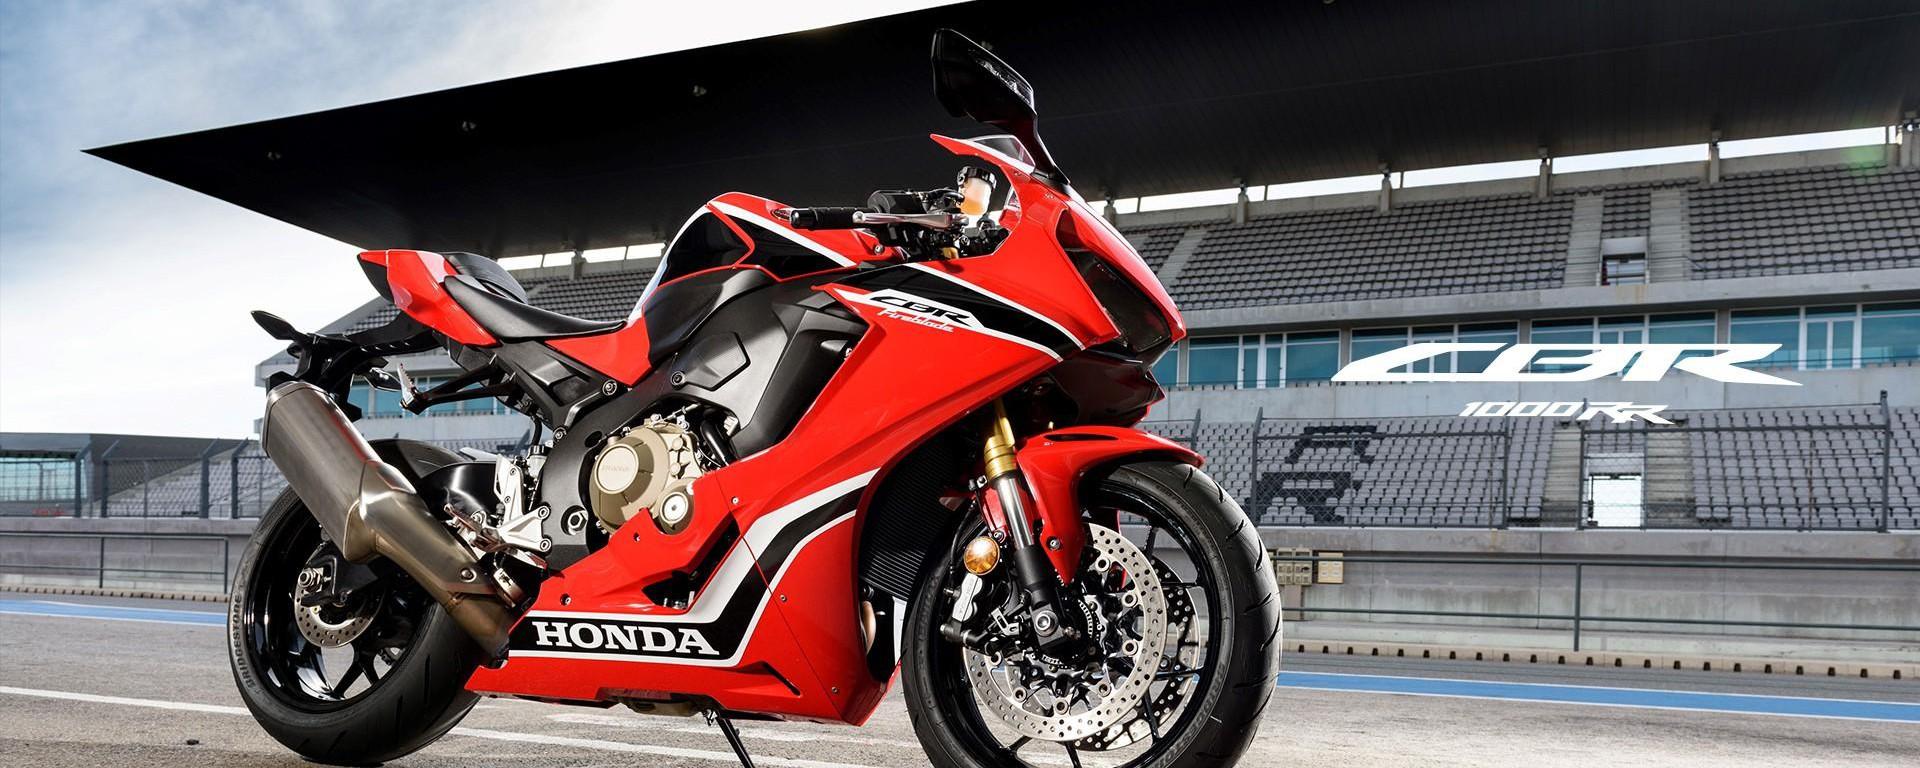 Honda-bigbike-Motorcycle-มอเตอร์ไซค์-บิ๊กไบค์-ฮอนด้า-CBR1000RR-RED